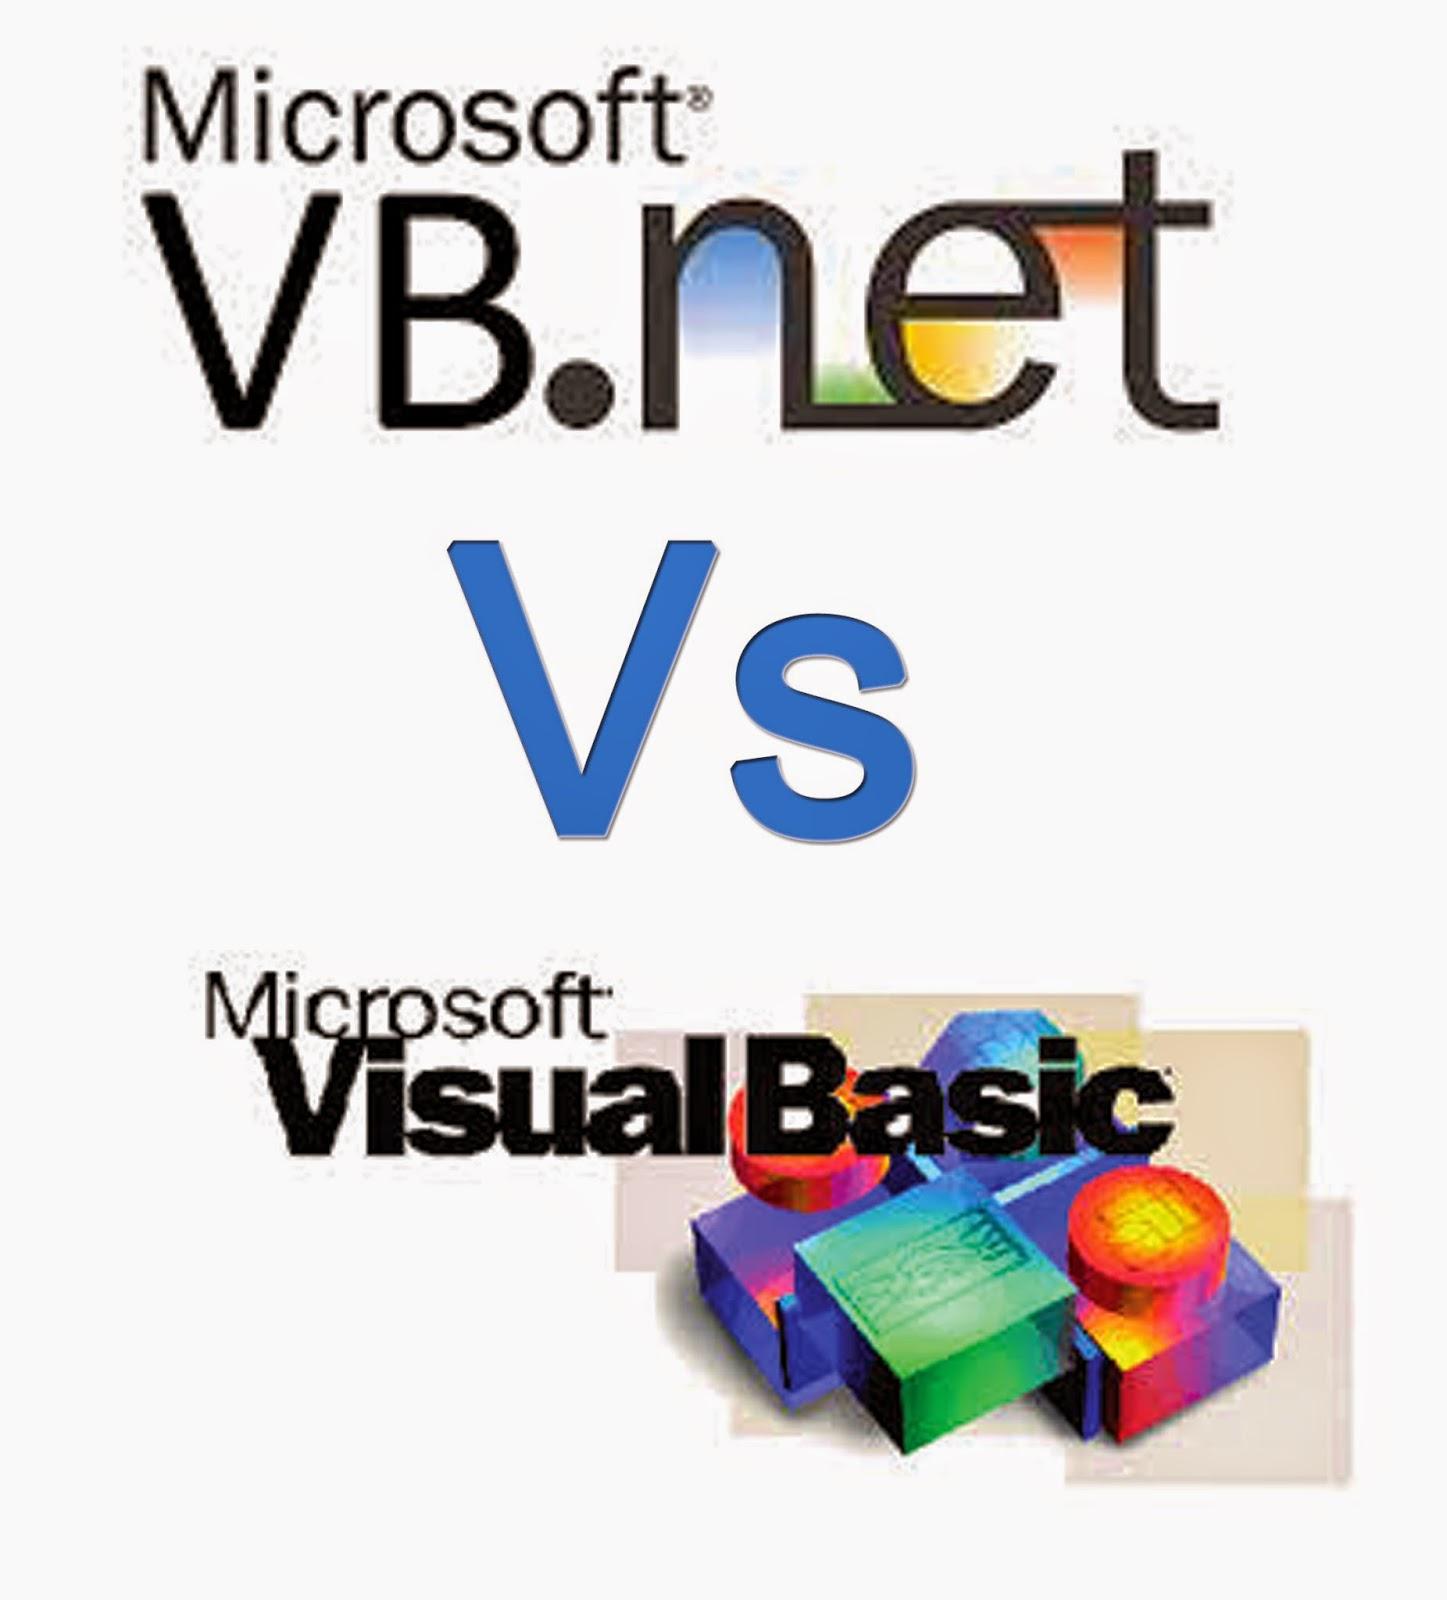 Perbedaan Vb.Net dan Vb 6